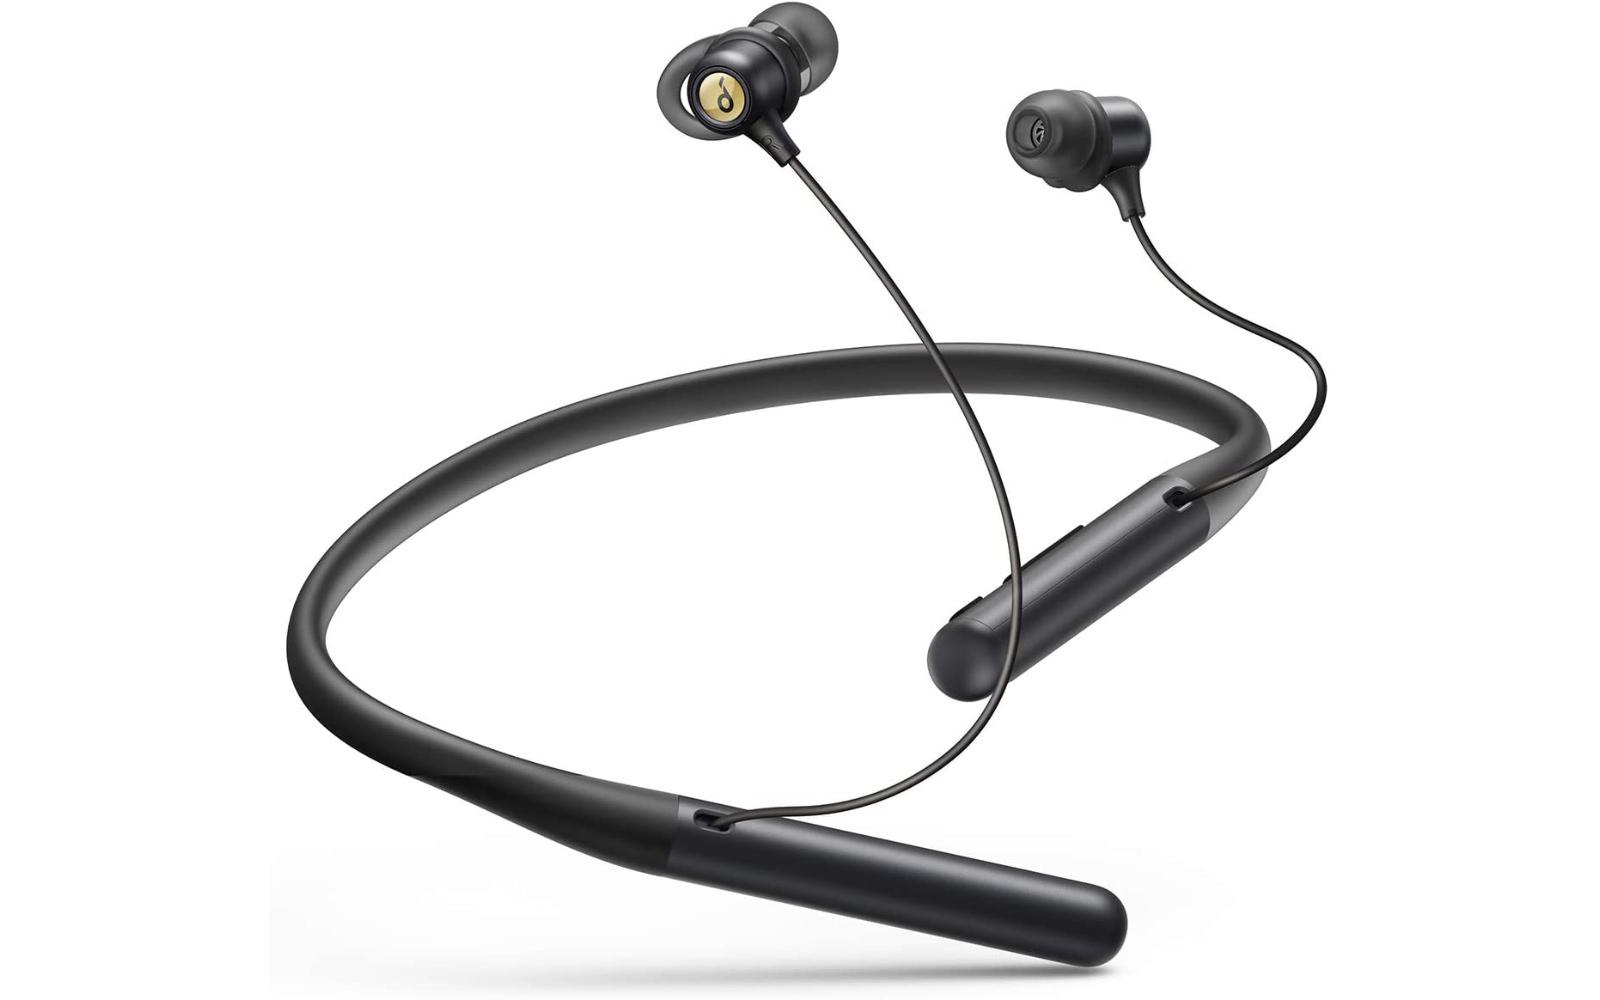 Anker-Soundcore-Life-u2-earphones.jpg